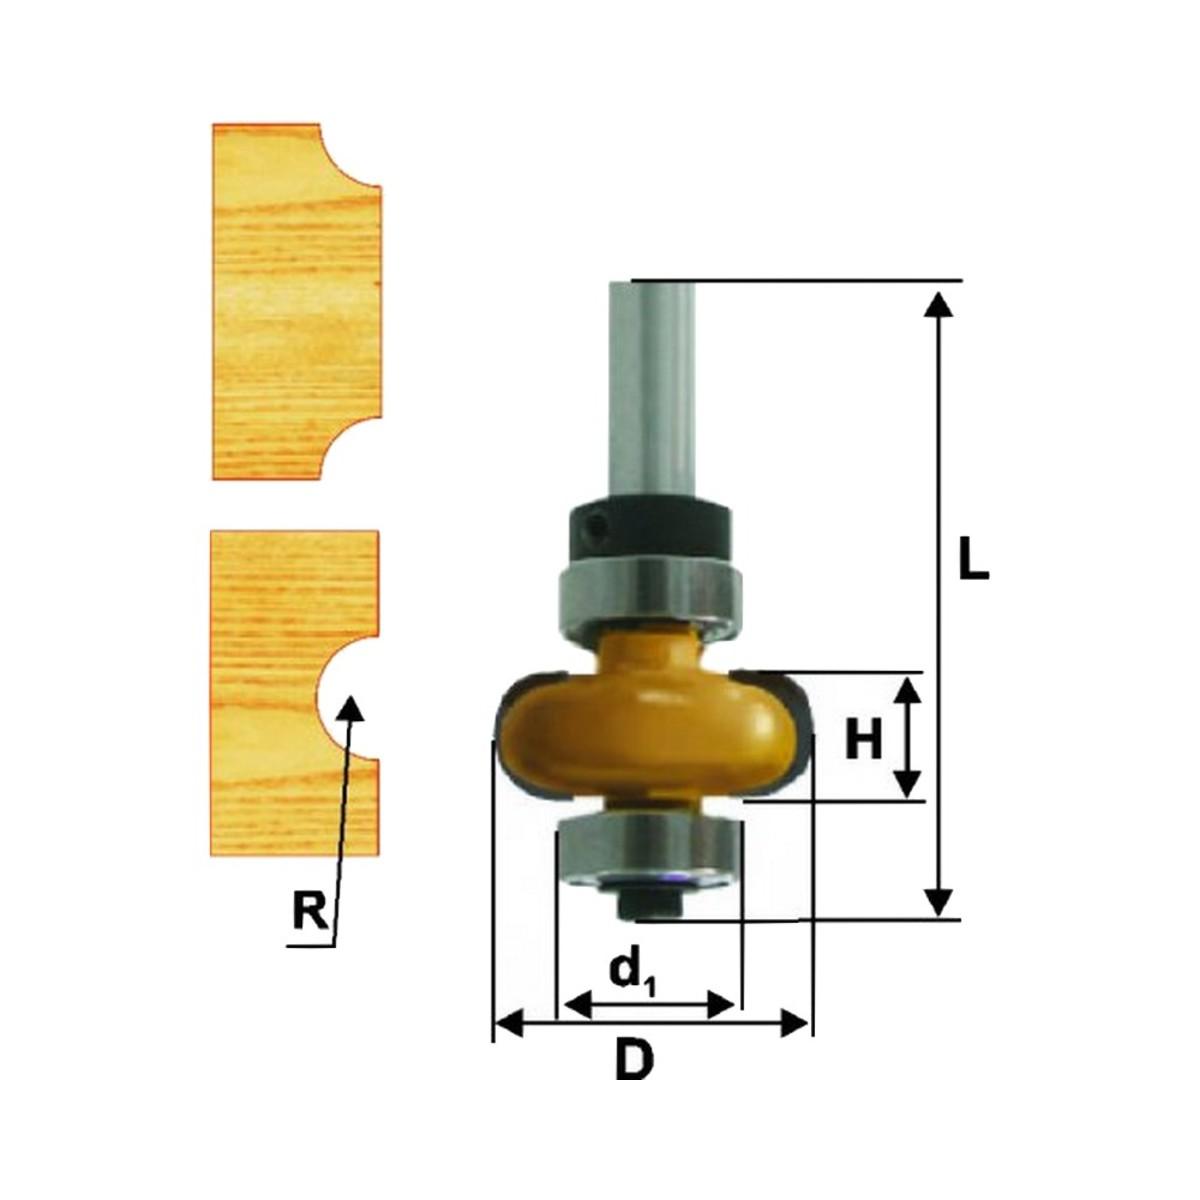 Фреза кромочная галтельная ЭНКОР 46391 ф25.4х9.5 мм R4.8 мм 8 мм